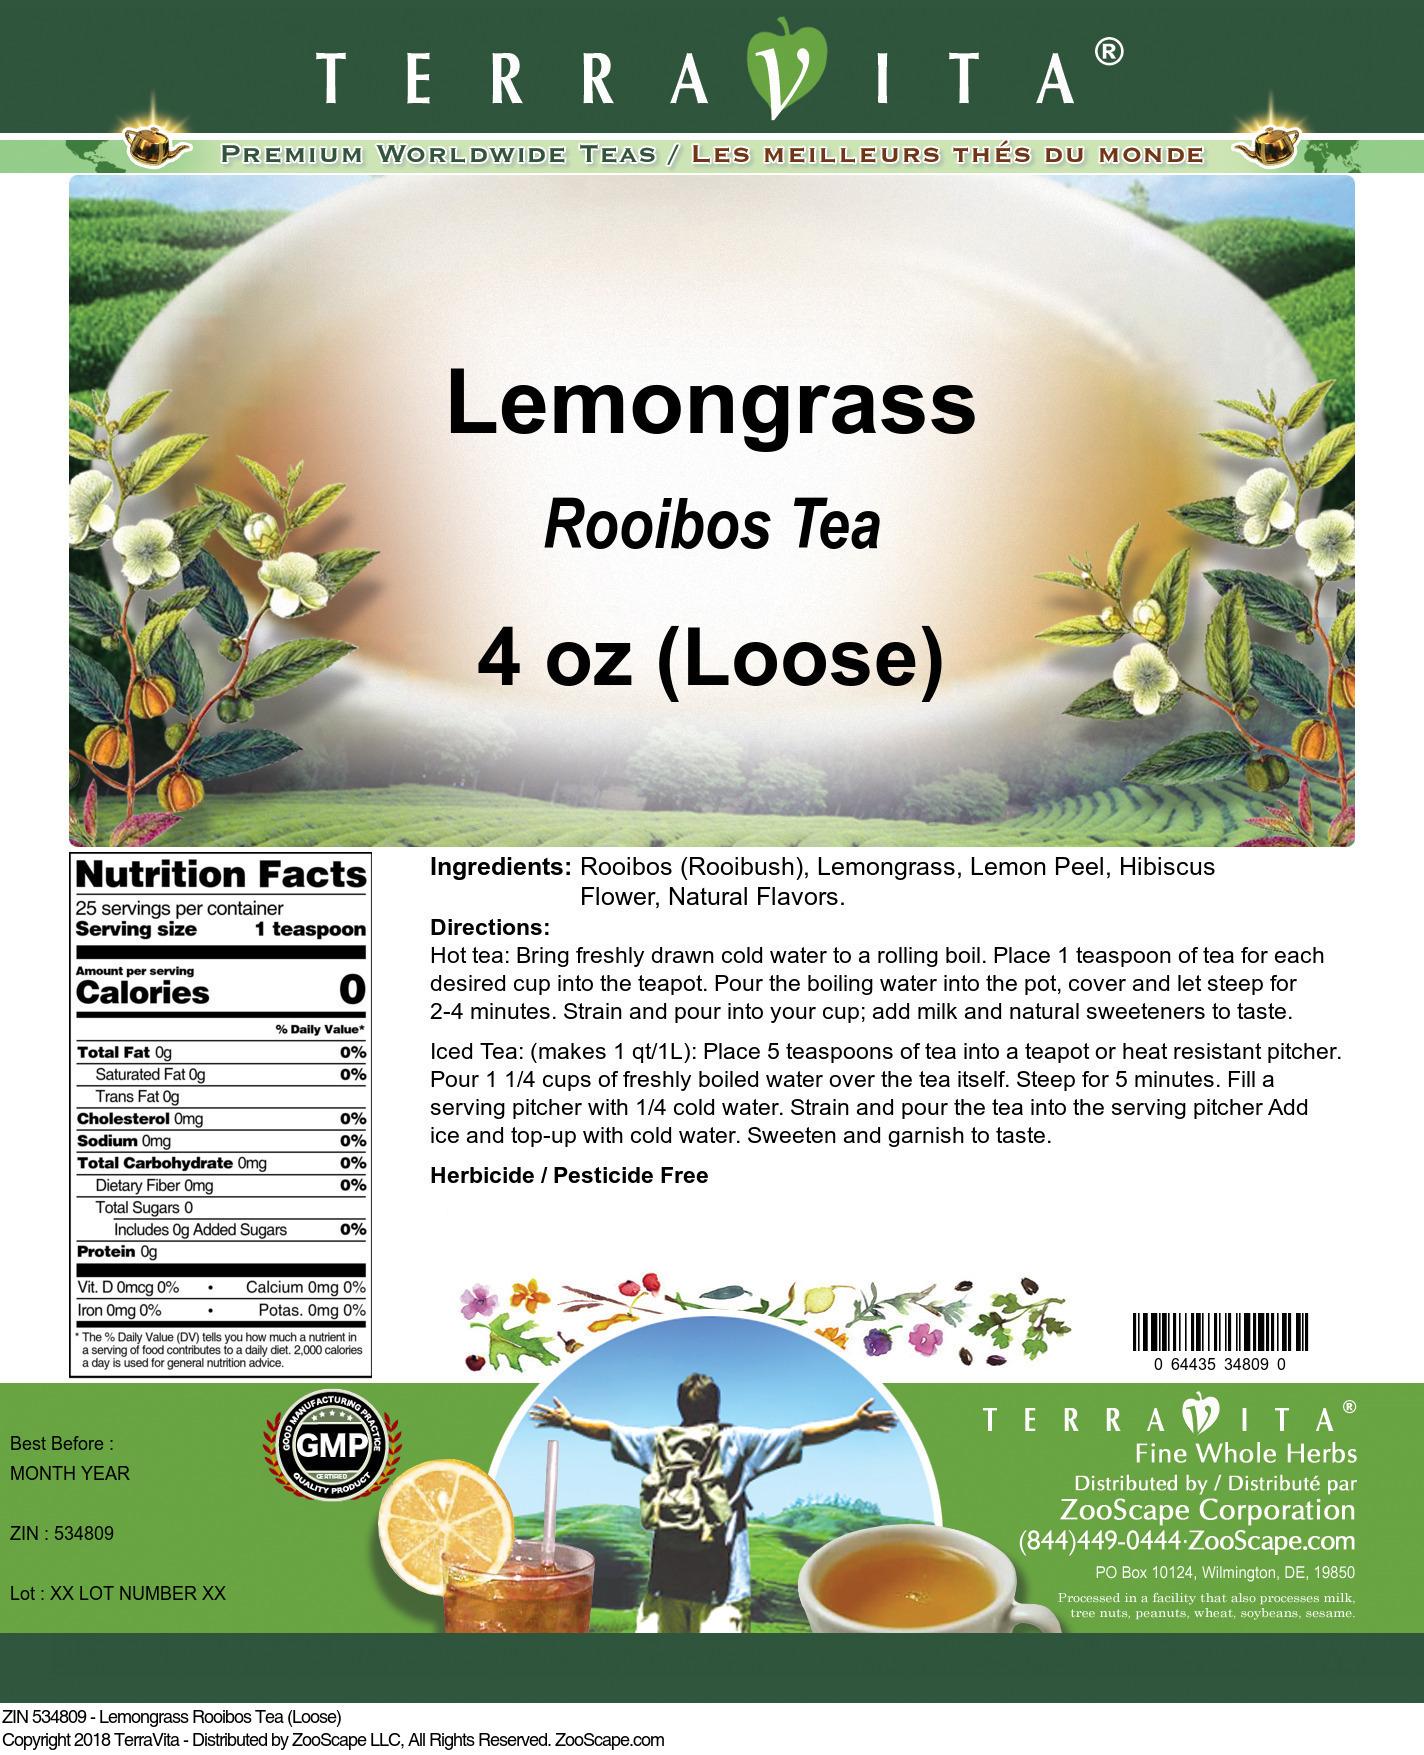 Lemongrass Rooibos Tea